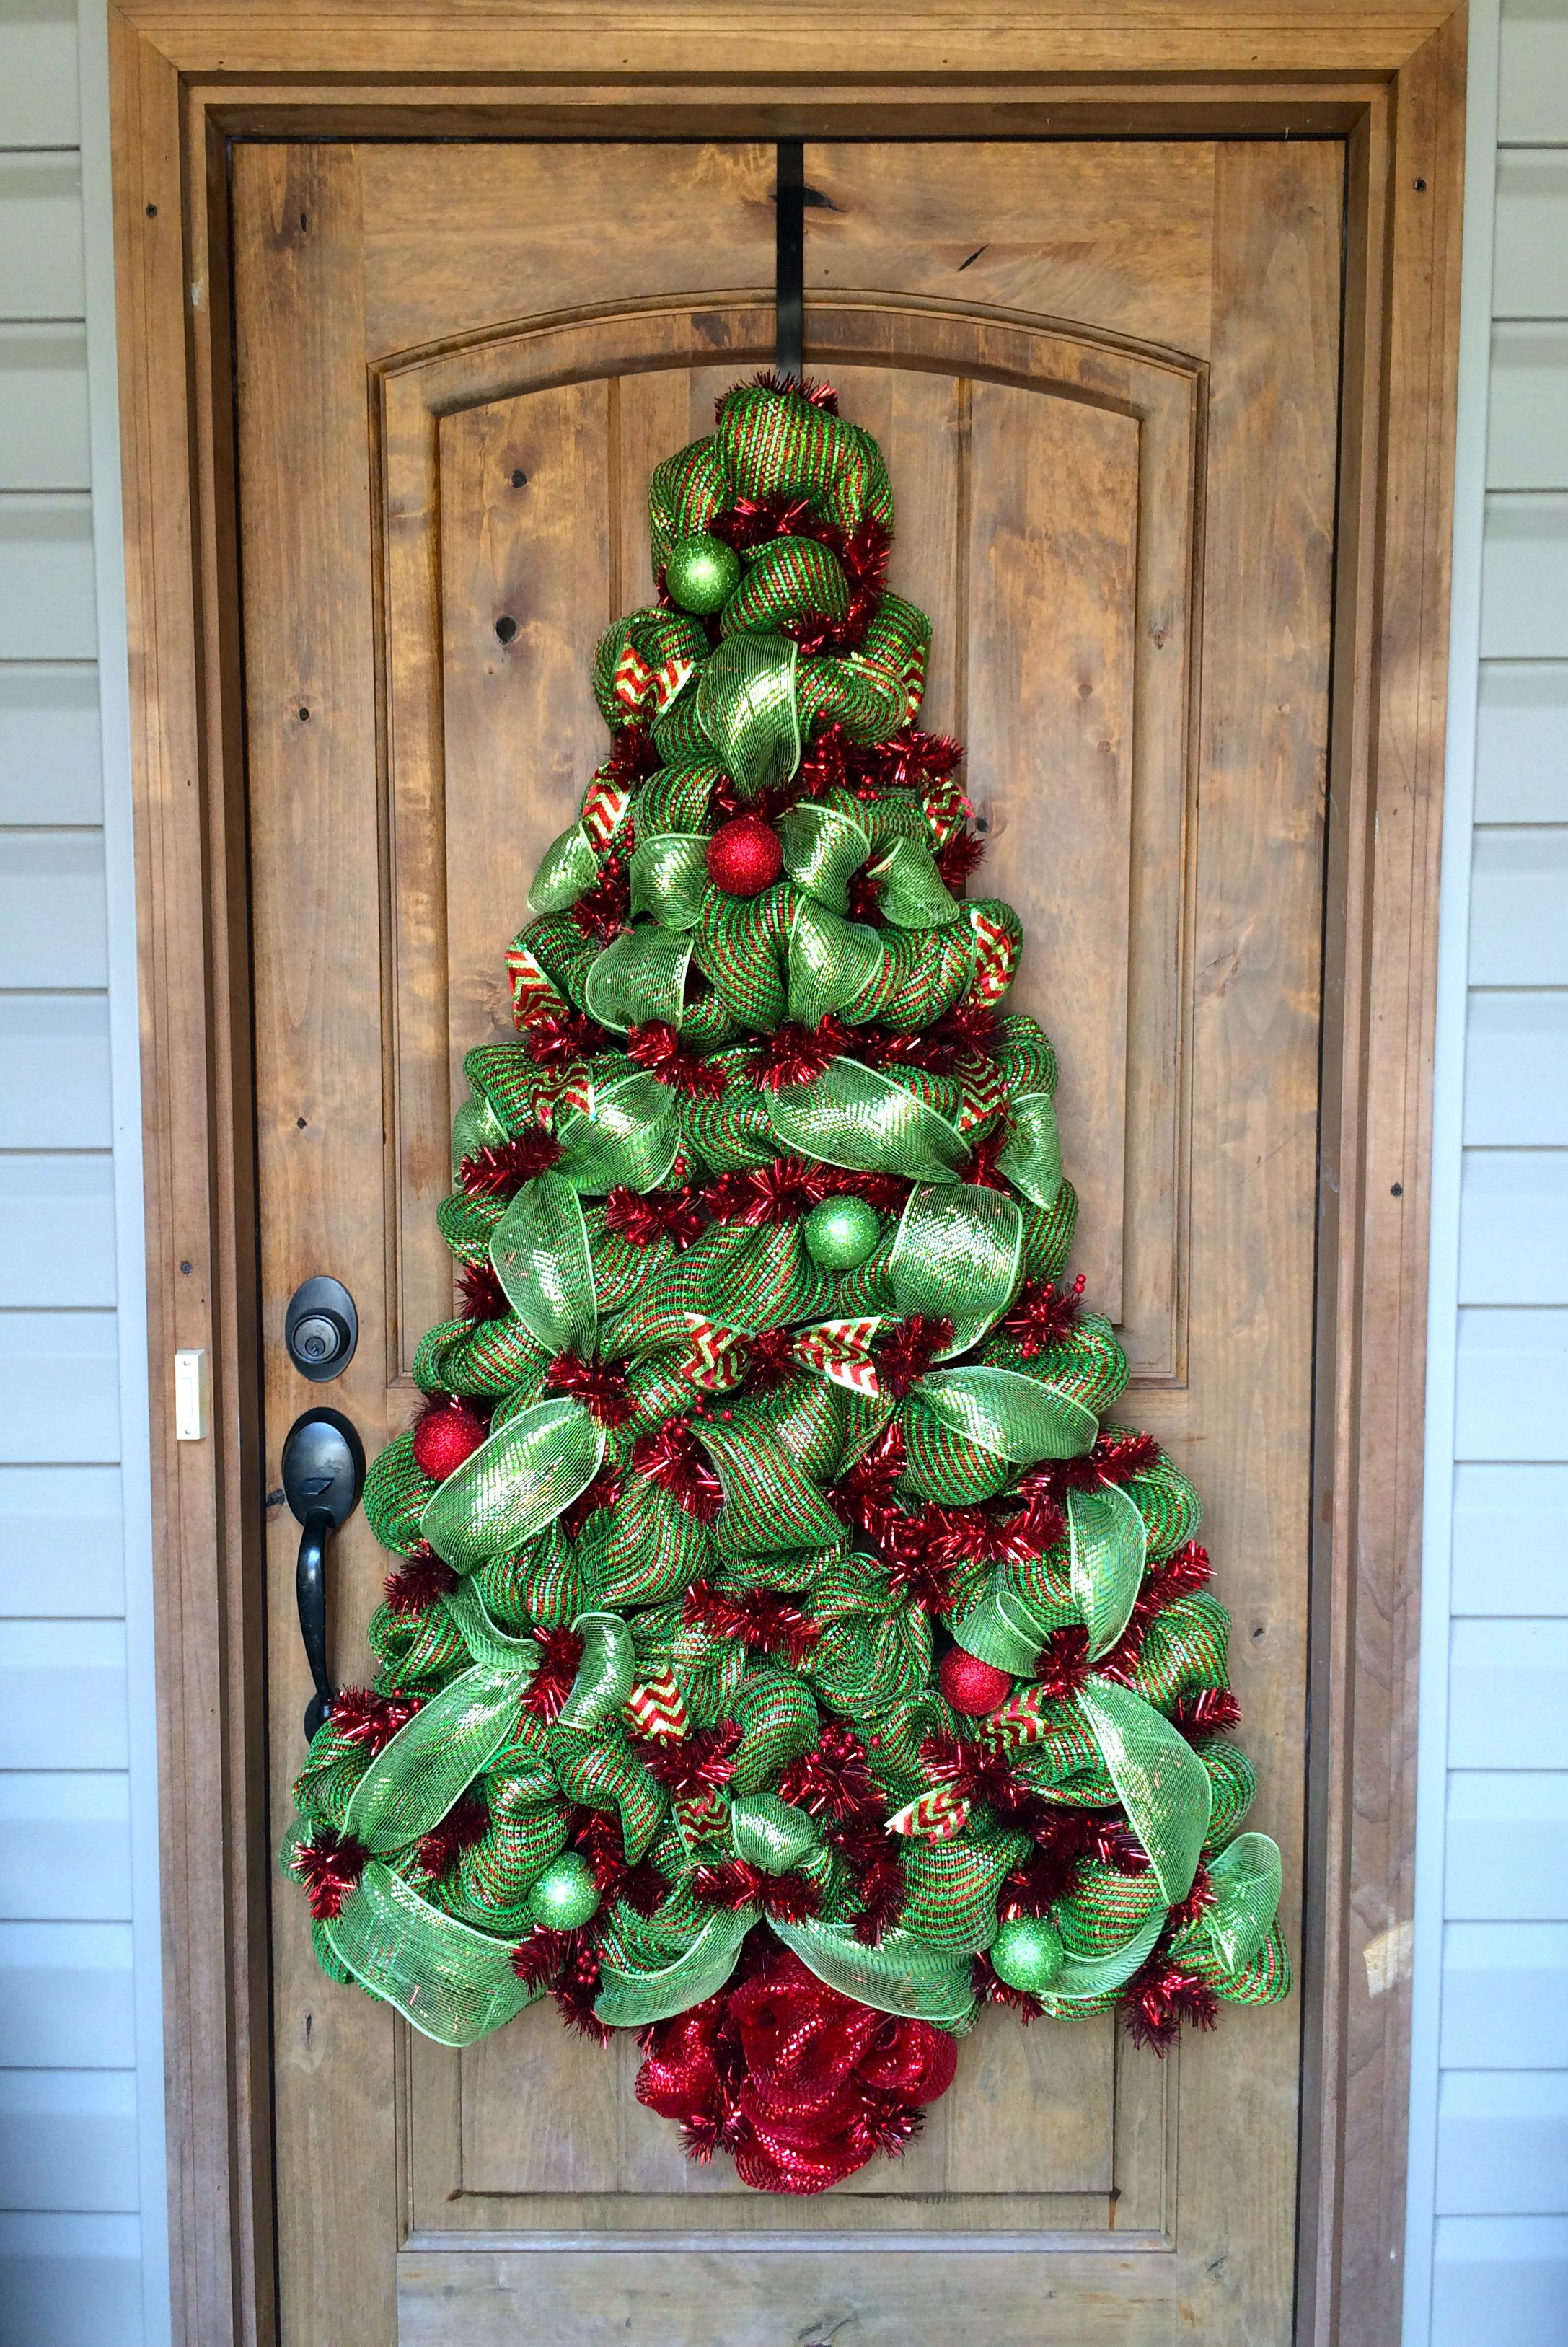 Deco Mesh Christmas Tree Decoration Bayouburlapandbling Deco Mesh Christmas Wreaths Mesh Christmas Tree Christmas Mesh Wreaths